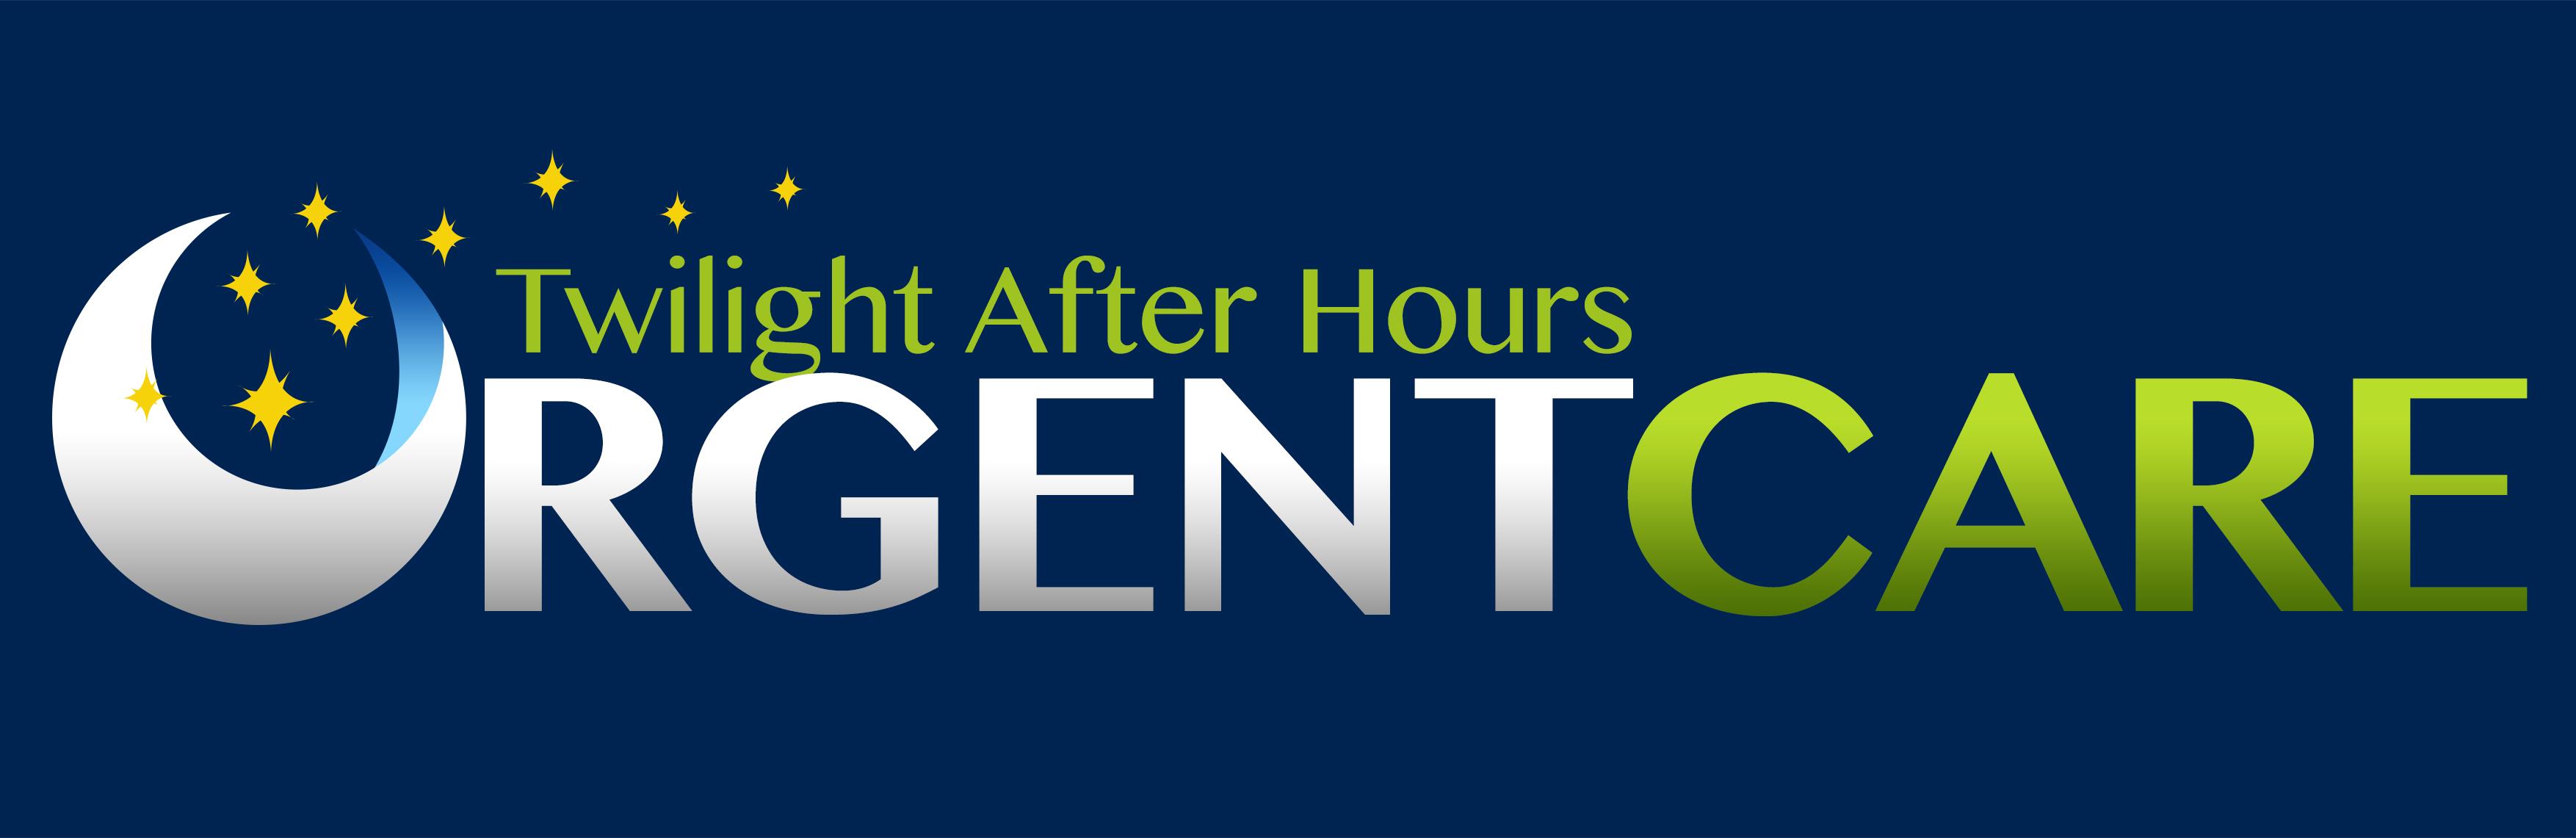 Twilight After Hours Urgent Care